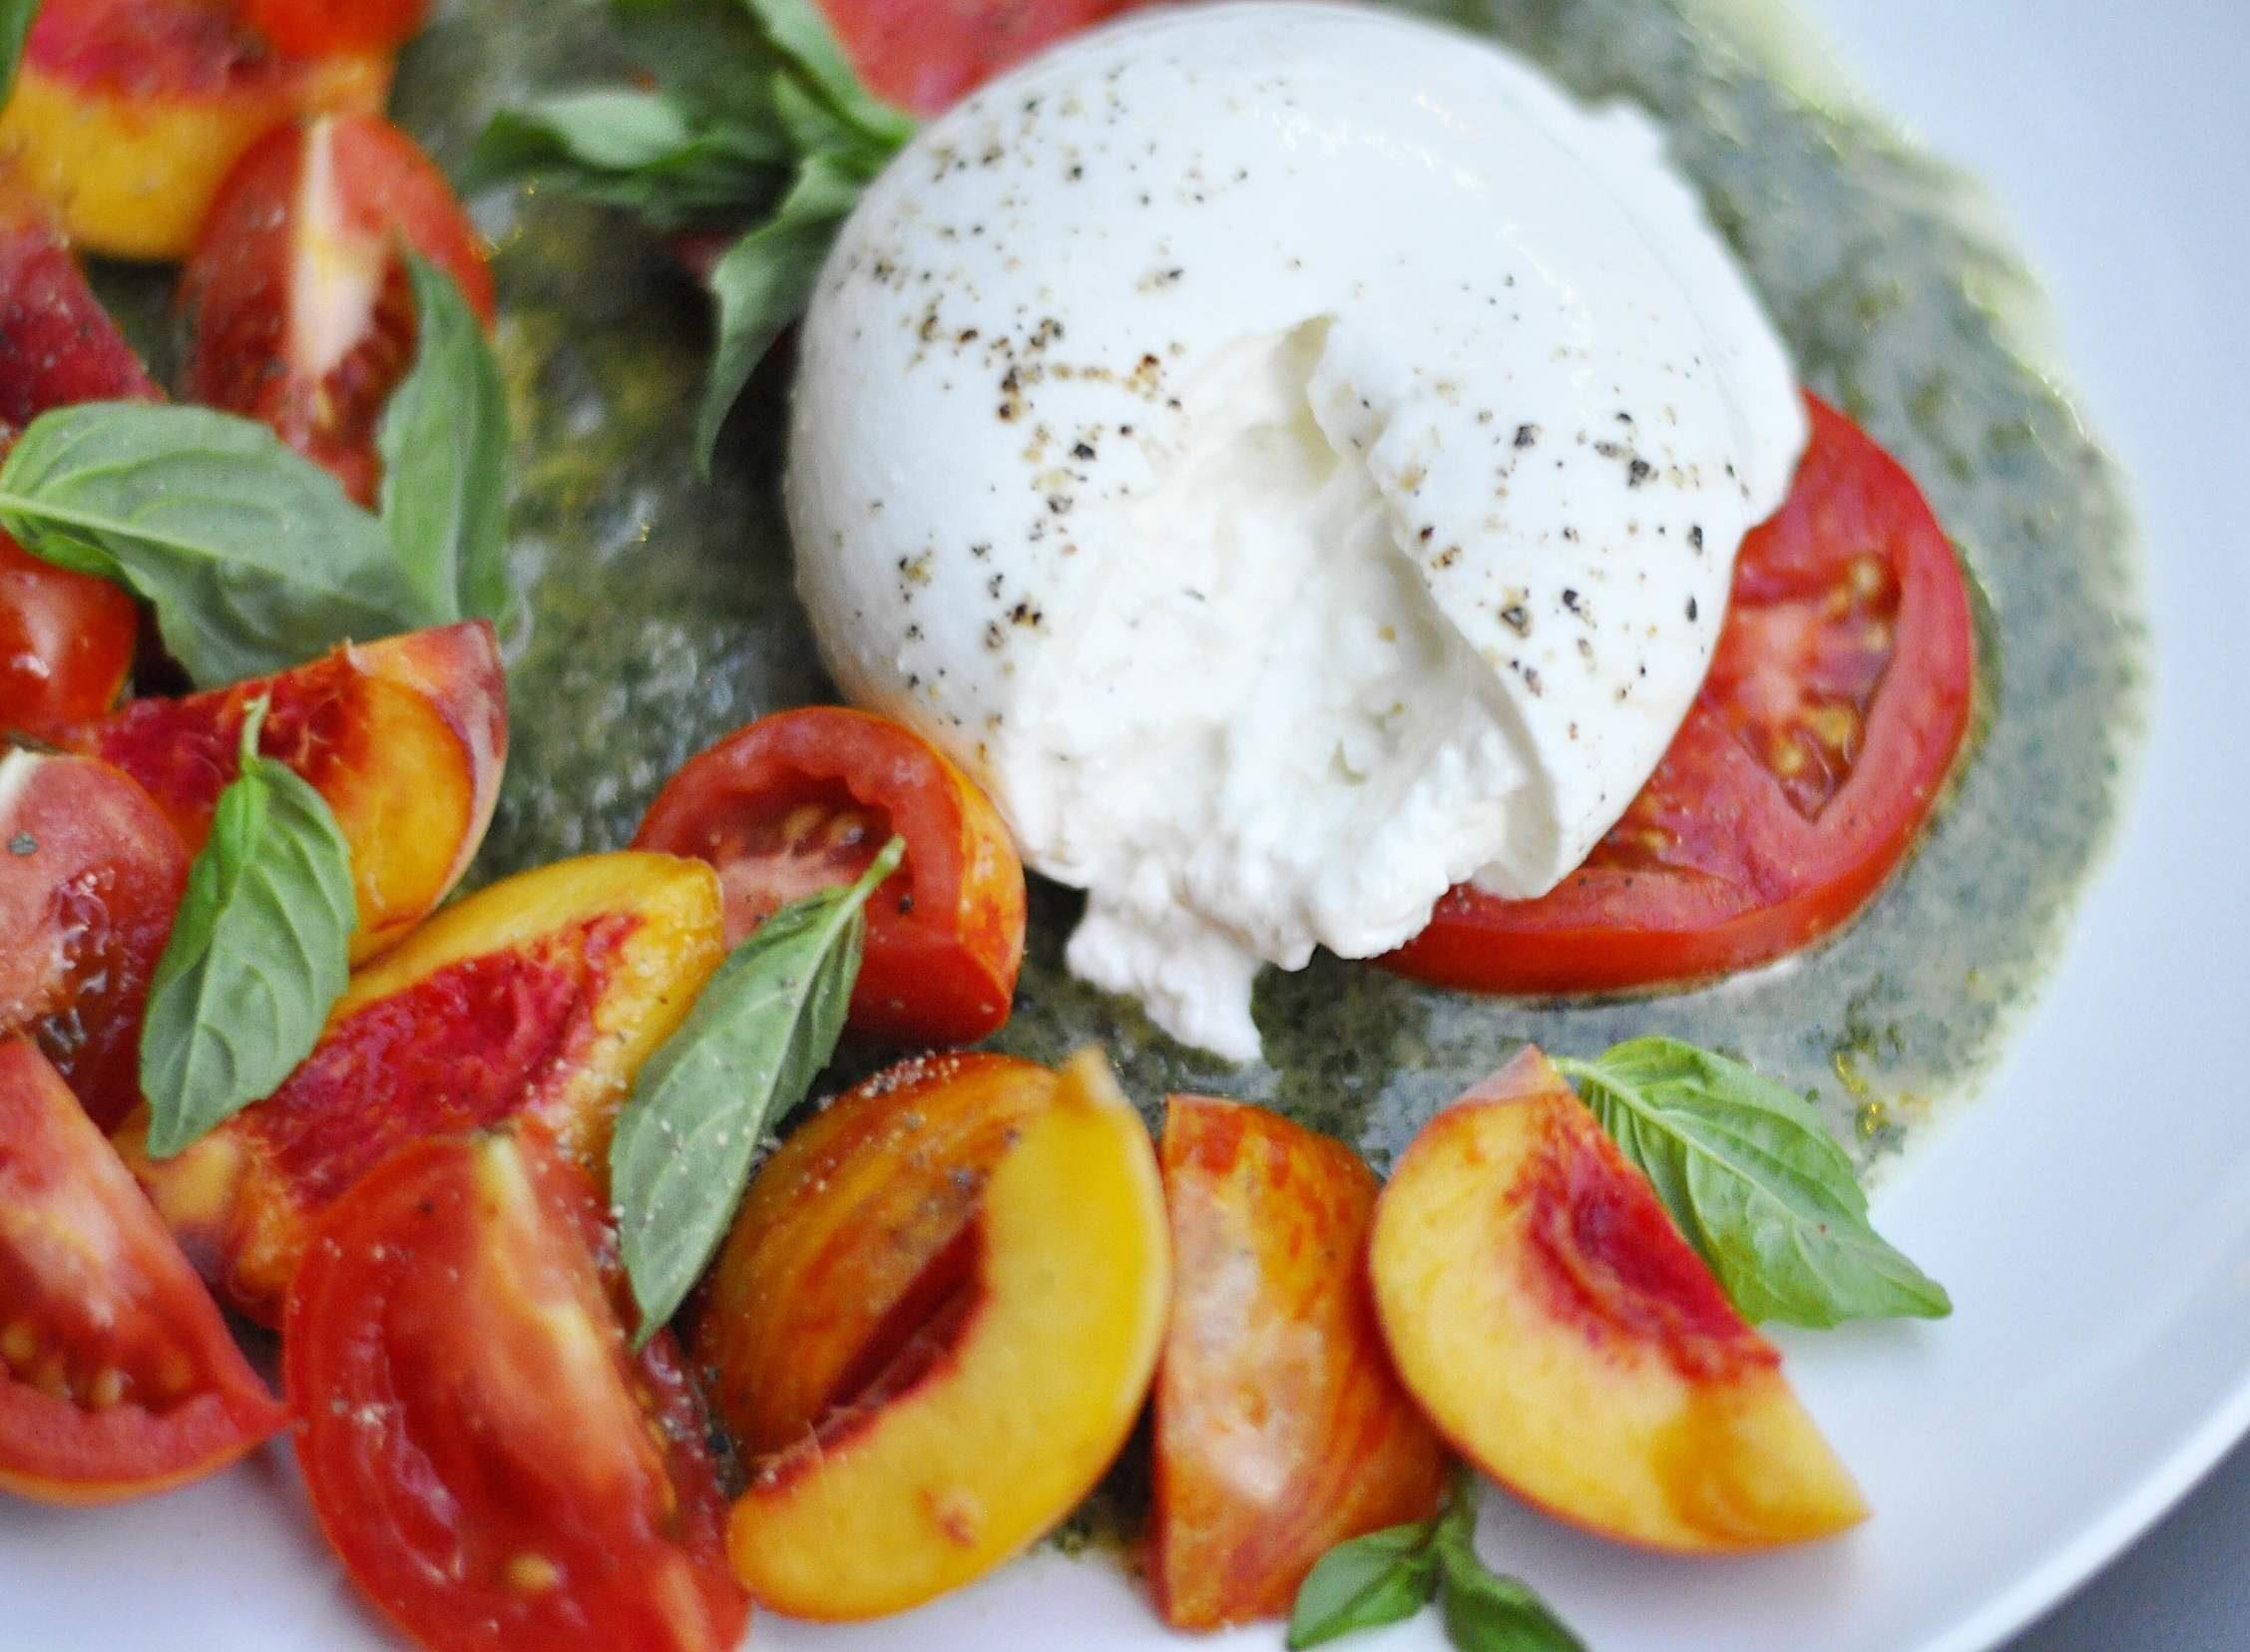 Peach, Tomato, and Burrata Salad on a white plate